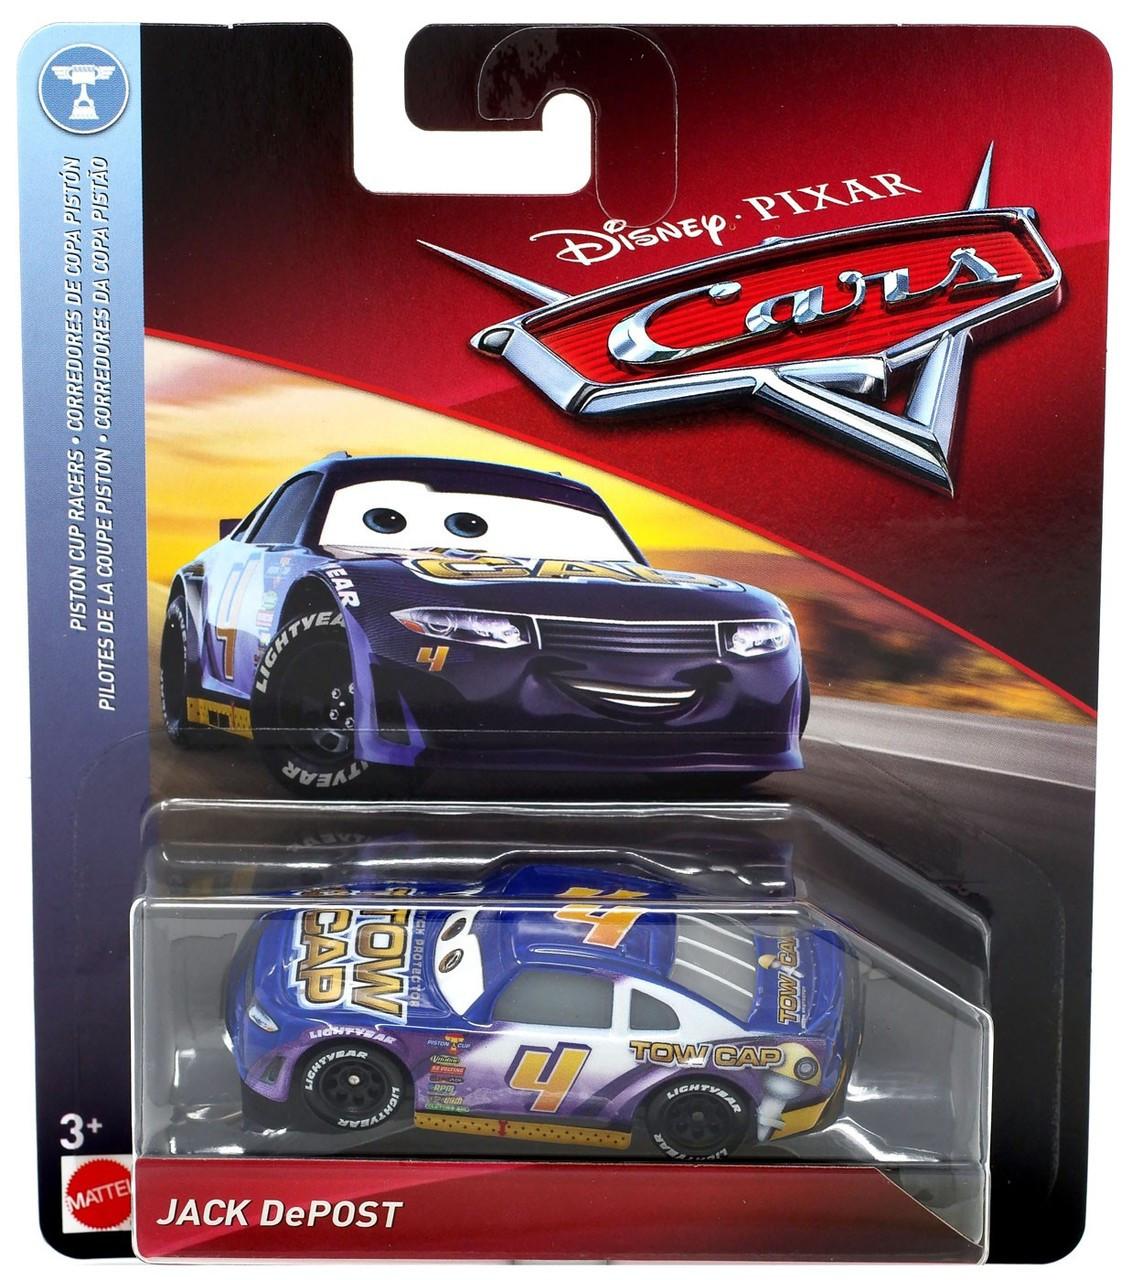 cars 3 toys  Disney / Pixar Cars Cars 6 Piston Cup Racers Jack DePost Diecast Car